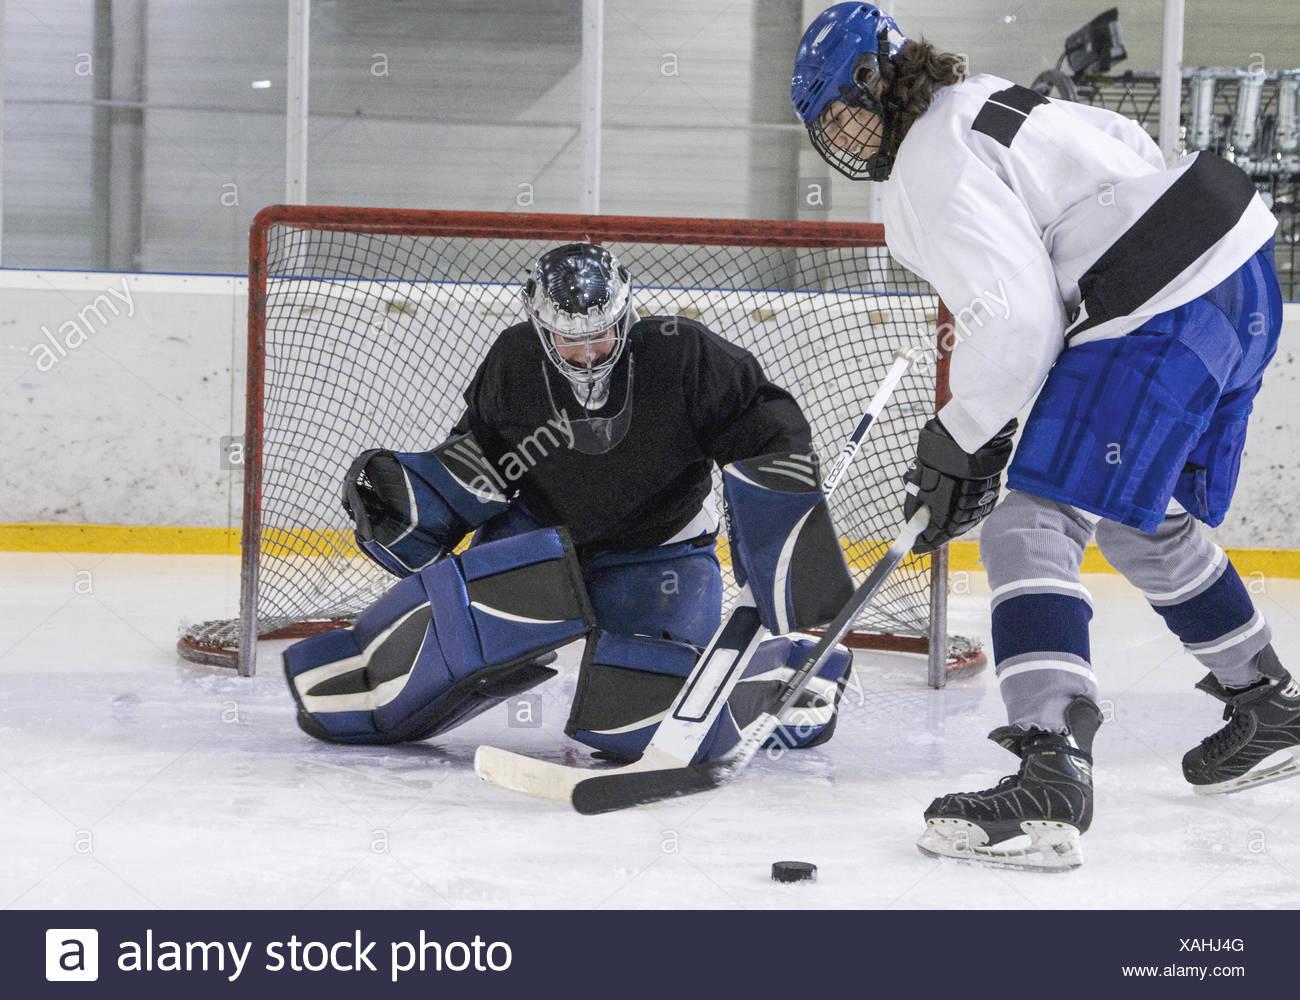 Eishockey, Angreifer vor Torhueter (model-released) - Stock Image